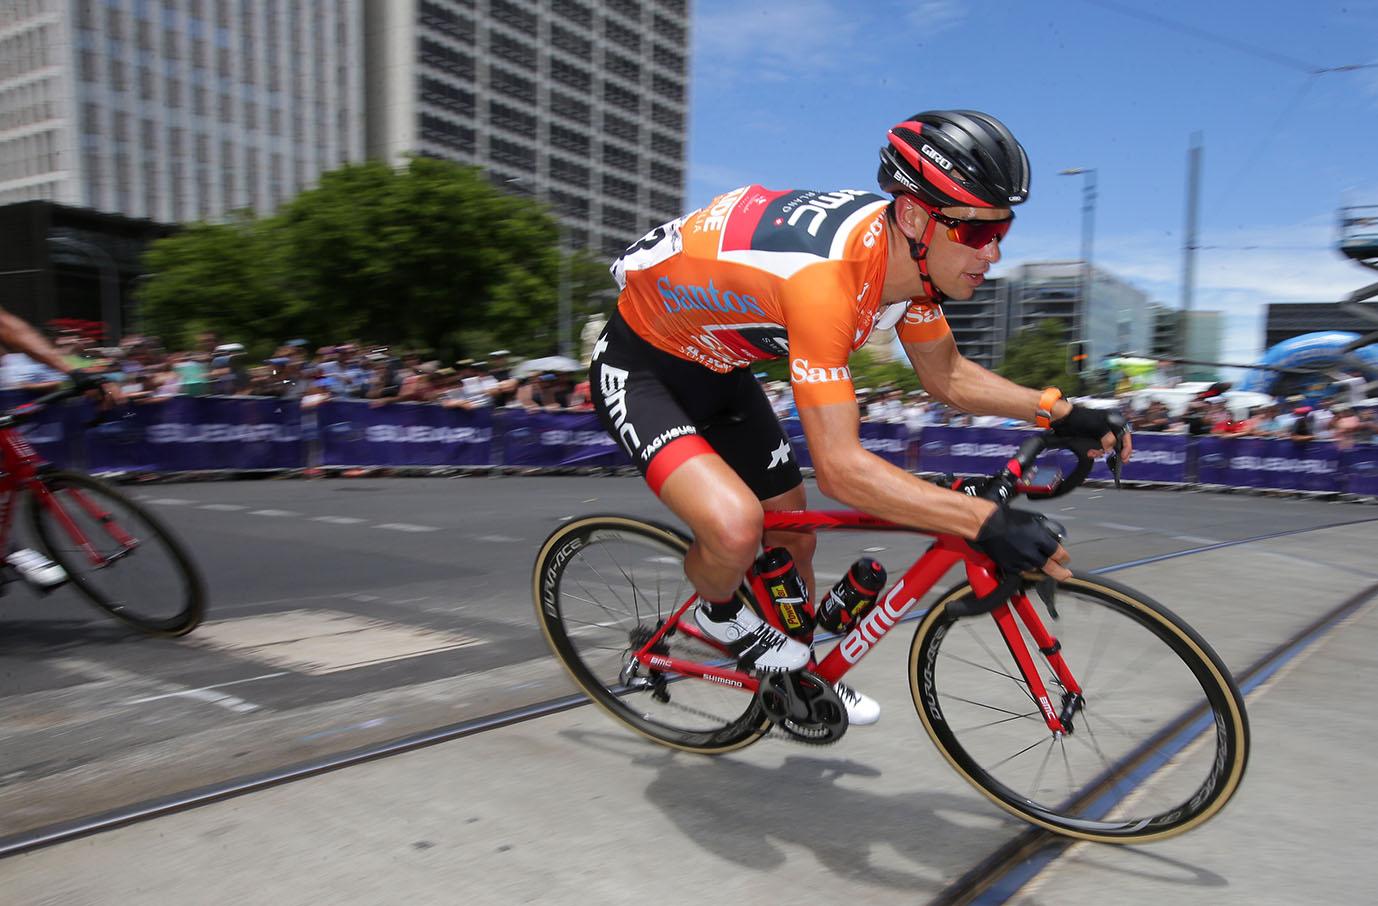 Santos Tour Down Under Champion Richie Porte (BMC Racing)